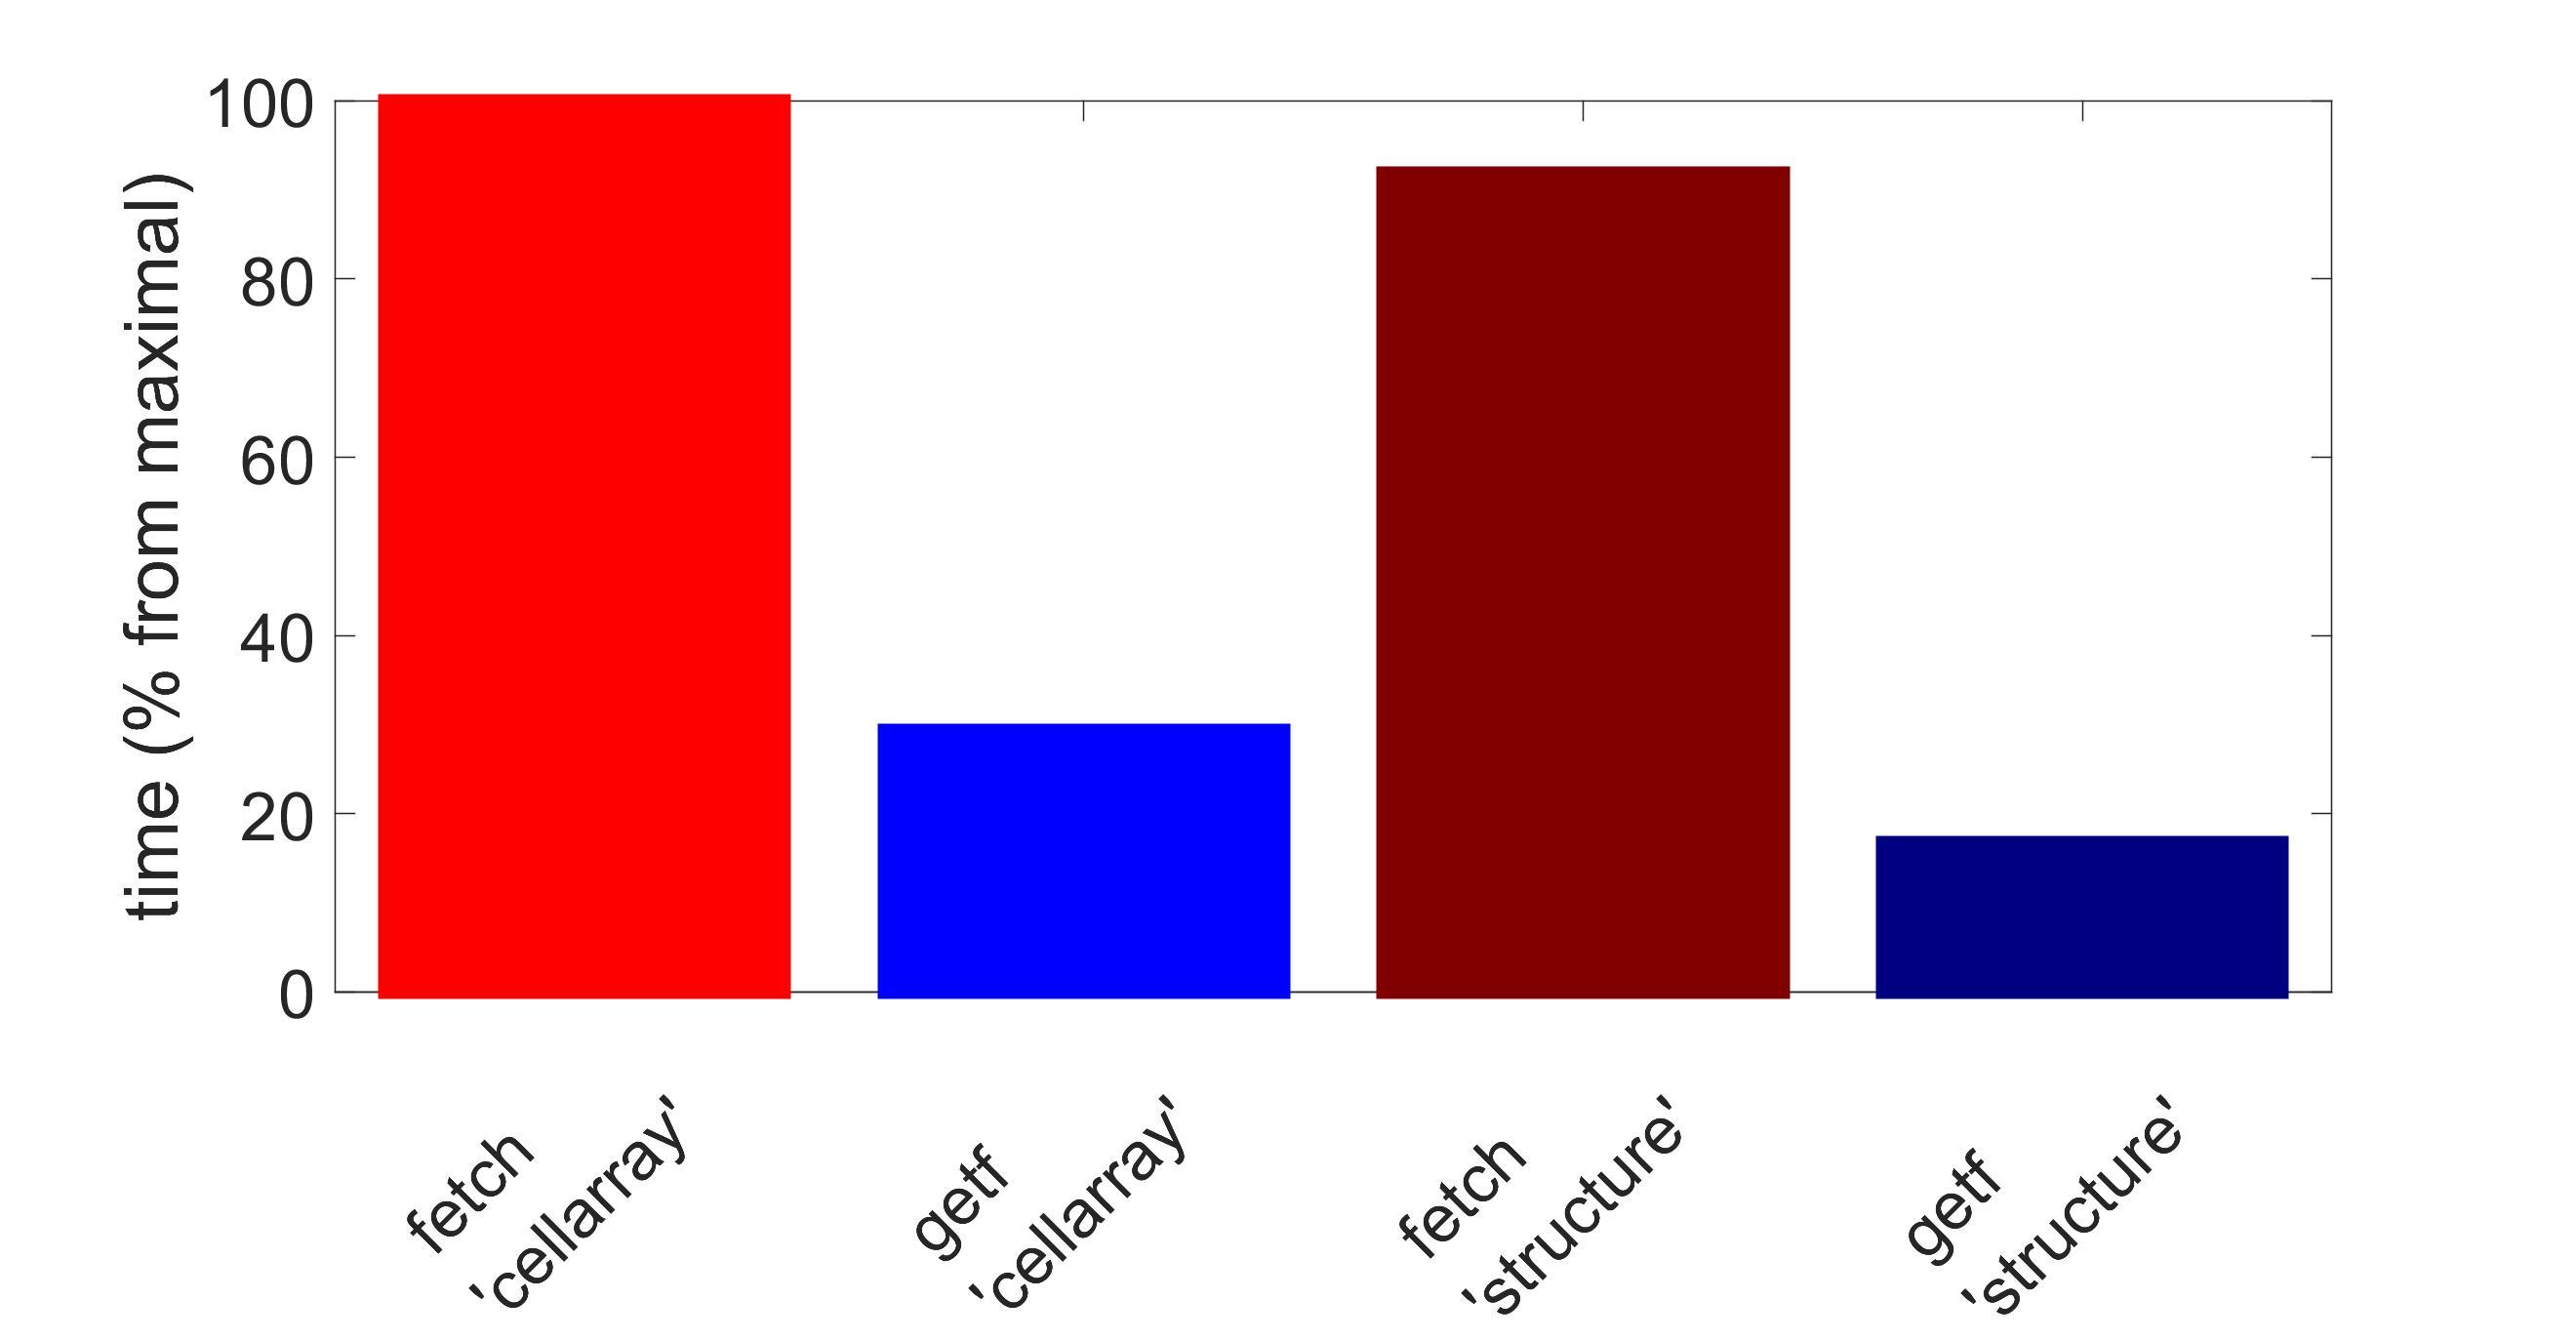 Performance comparison of PostgreSQL connectors in Matlab, Part II